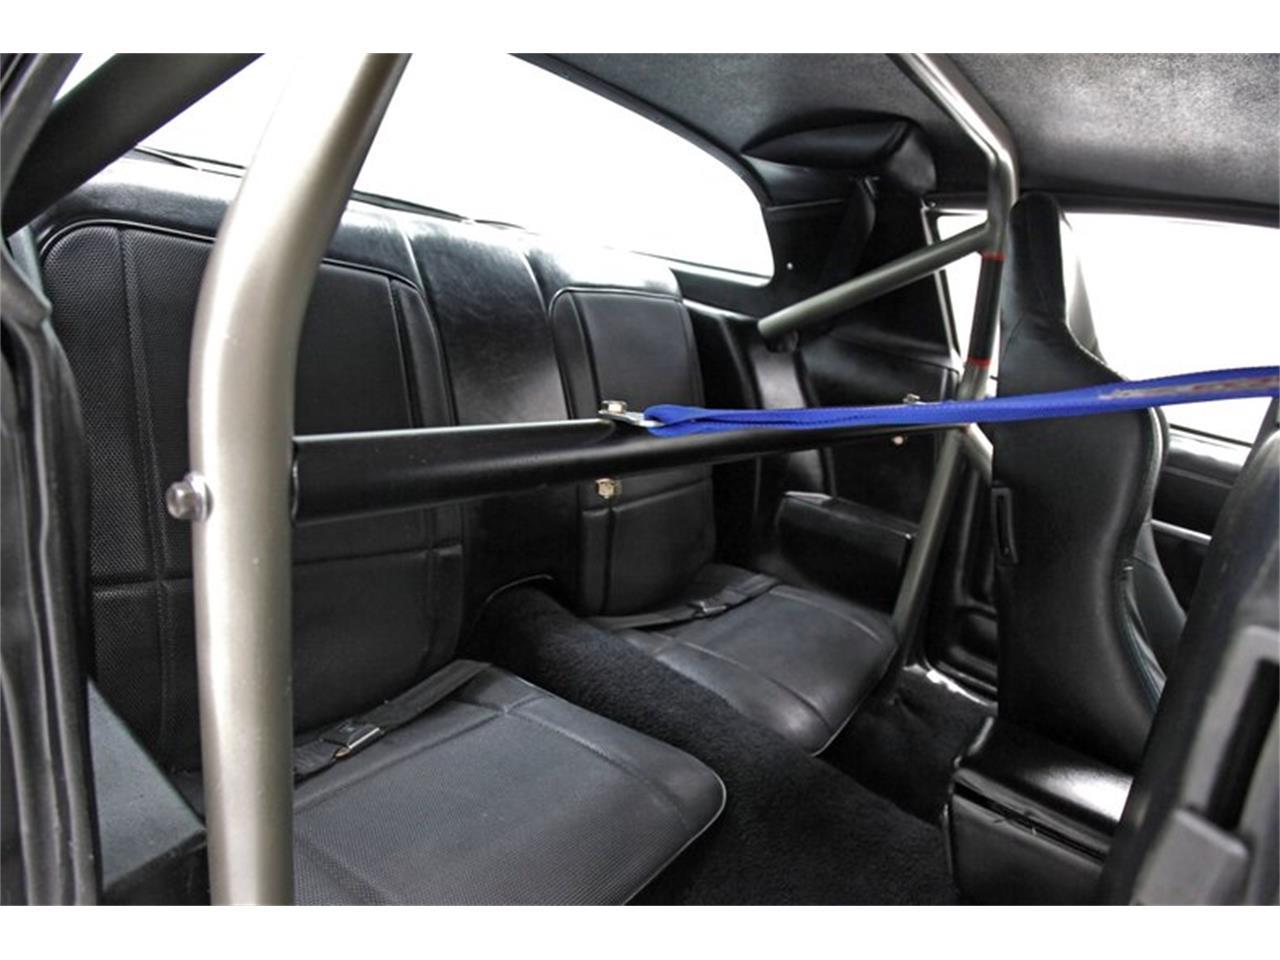 1979 Chevrolet Camaro (CC-1354412) for sale in Morgantown, Pennsylvania